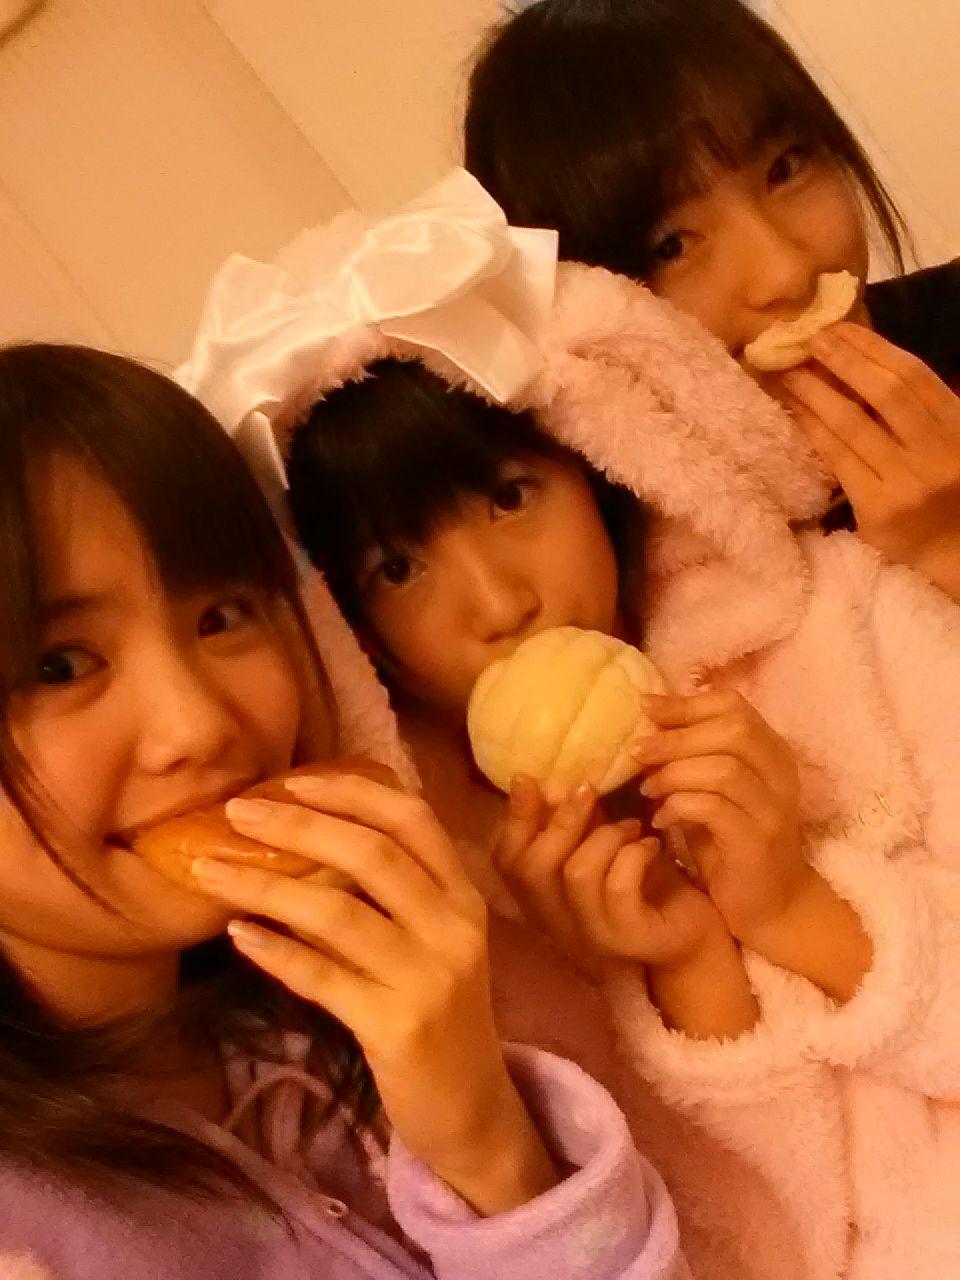 http://livedoor.blogimg.jp/otohaeika/imgs/c/b/cb387eec.jpg